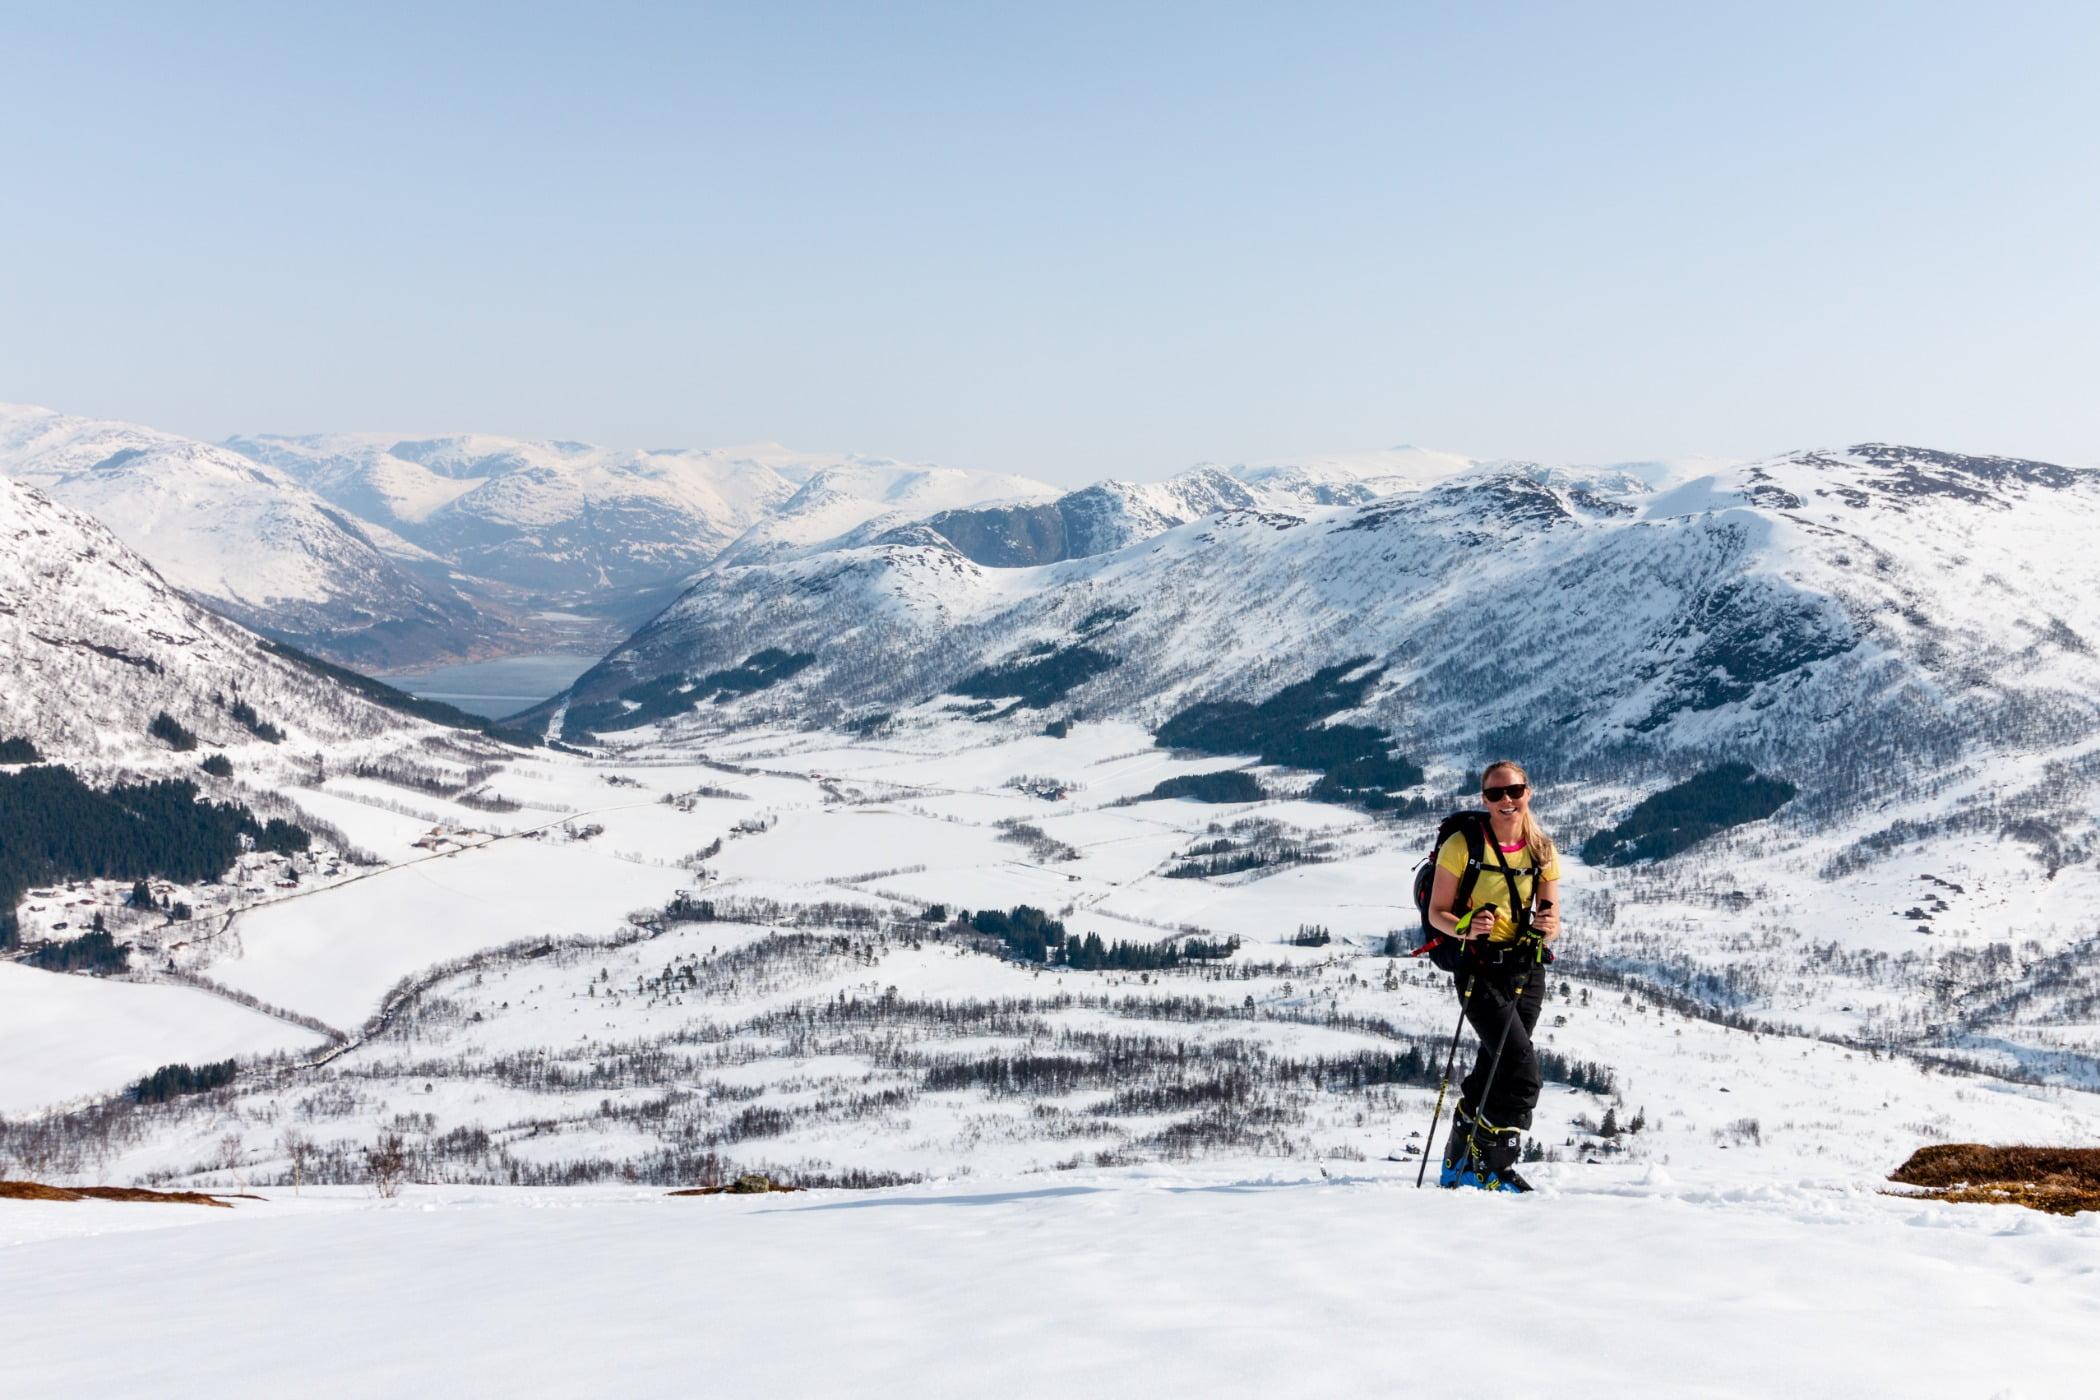 Ski pole, Outdoor recreation, Glacial landform, Winter sport, Mountainous landforms, Mountaineer, Mountain, Snow, Slope